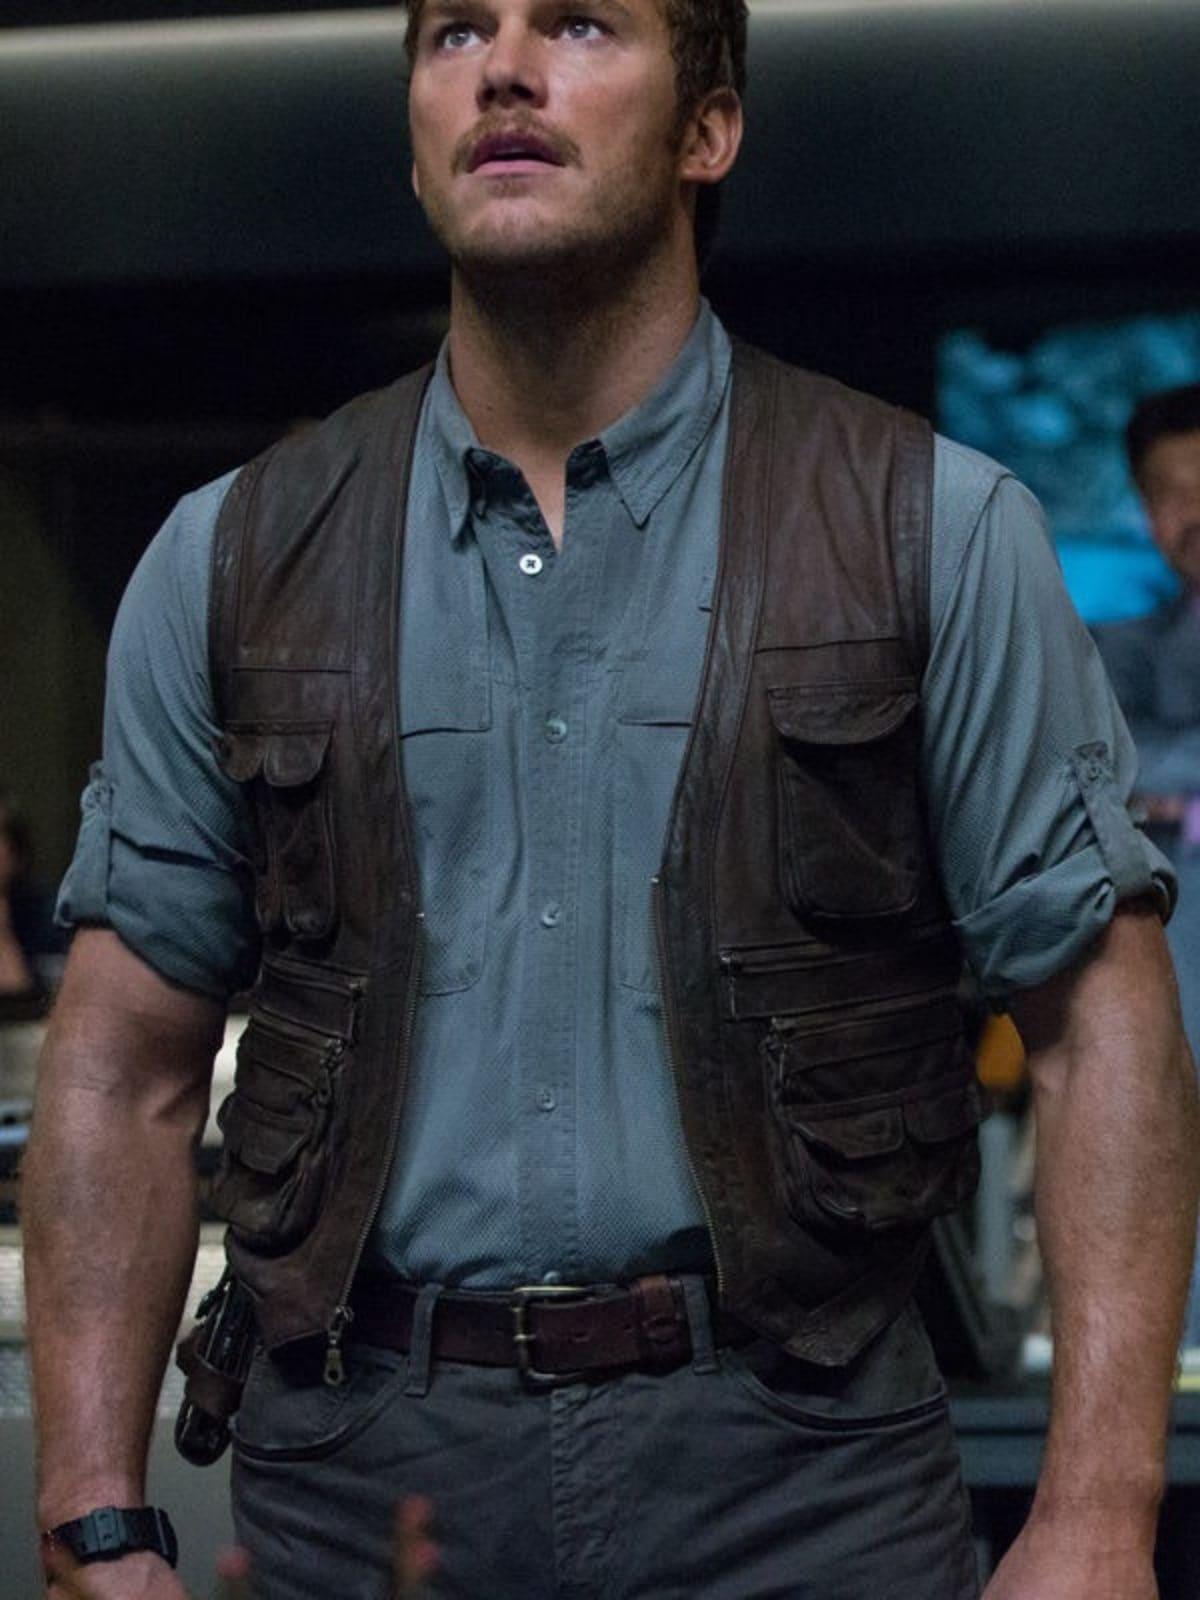 Jurassic World Chris Pratt Owen Grady Leather Vest